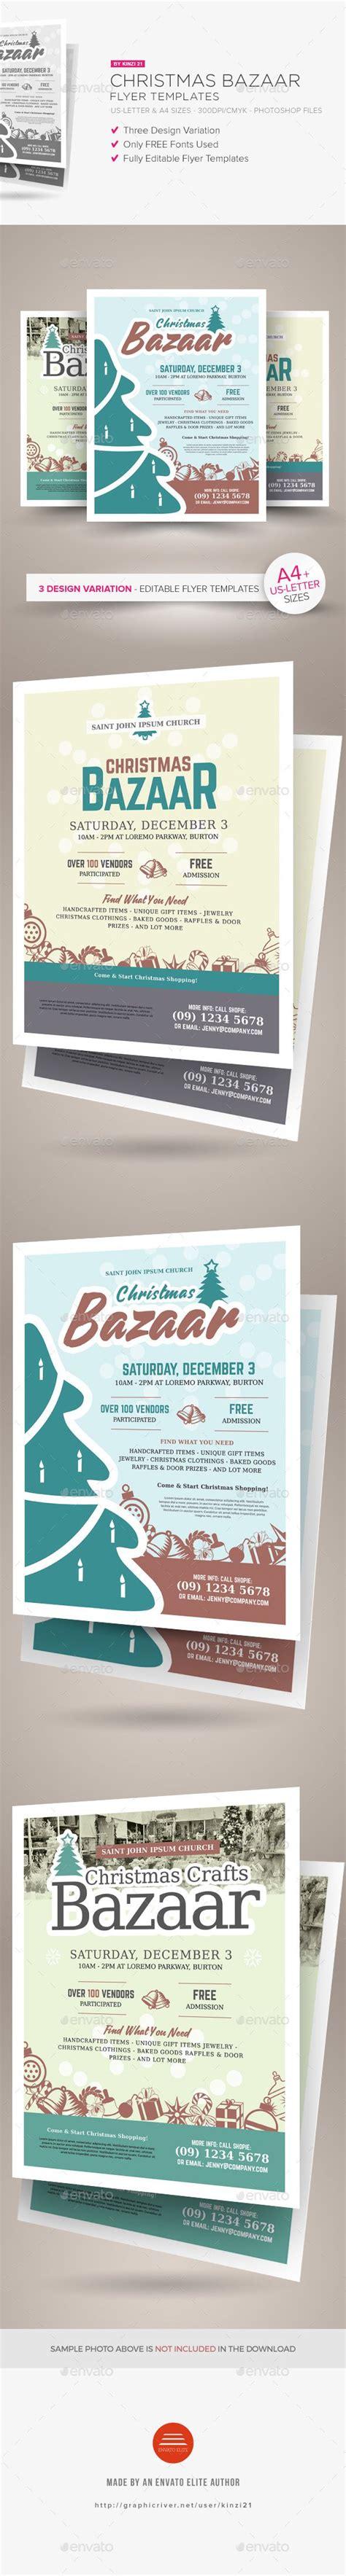 Christmas Bazaar Flyer Templates Art Art Country Crafts And Flyer Template Bazaar Flyer Template